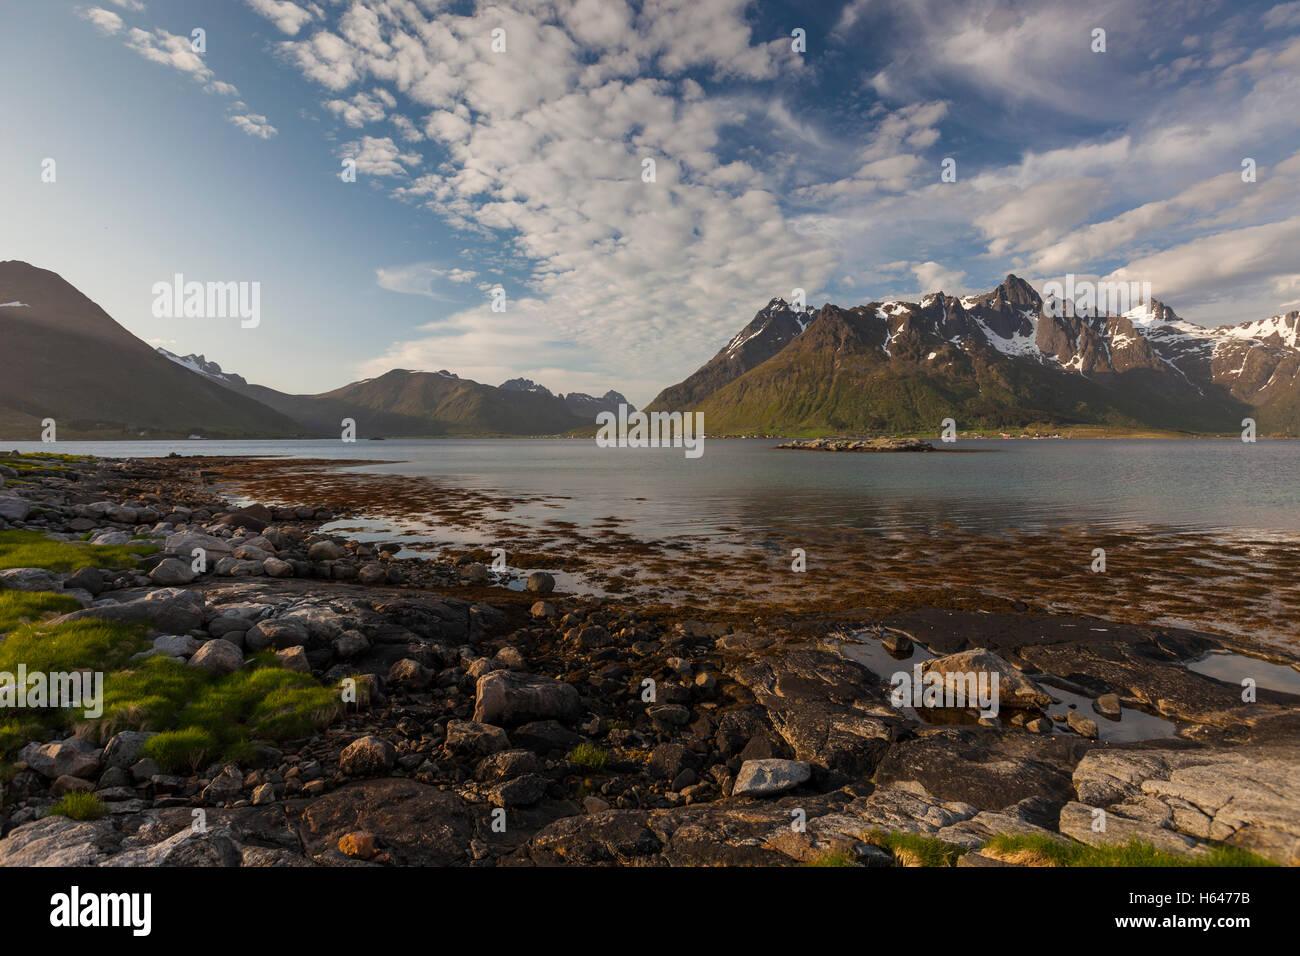 Sildpollnes, Austvagoy, Lofoten Islands, Norway - Stock Image